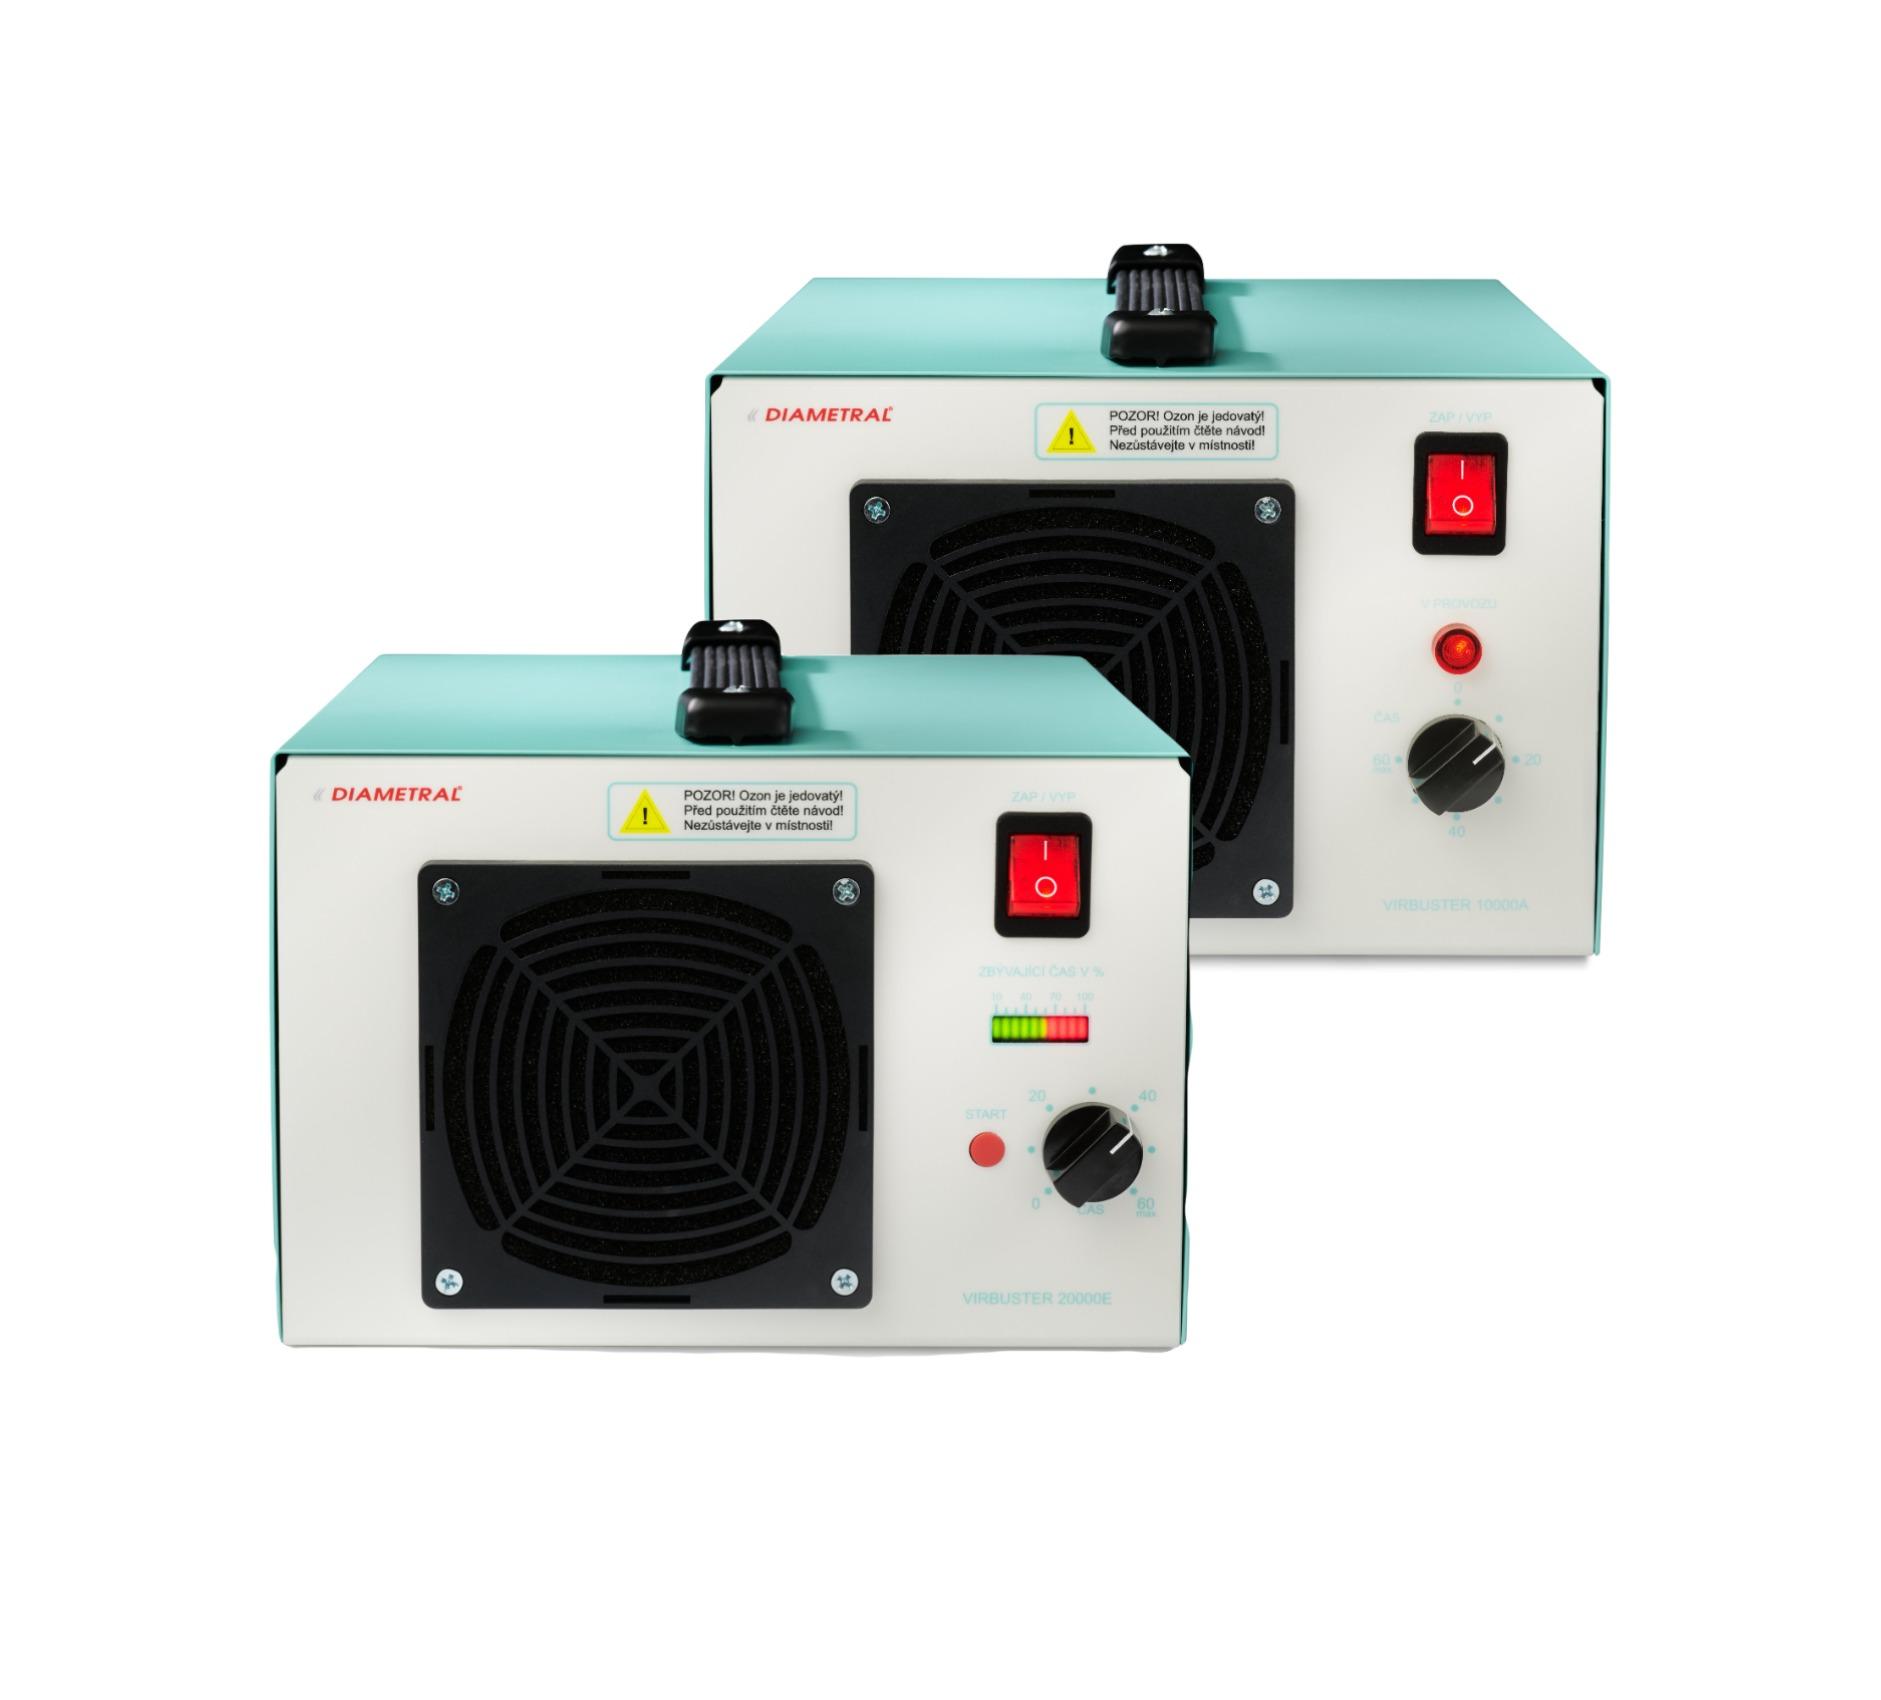 VirBuster generátor ozonu